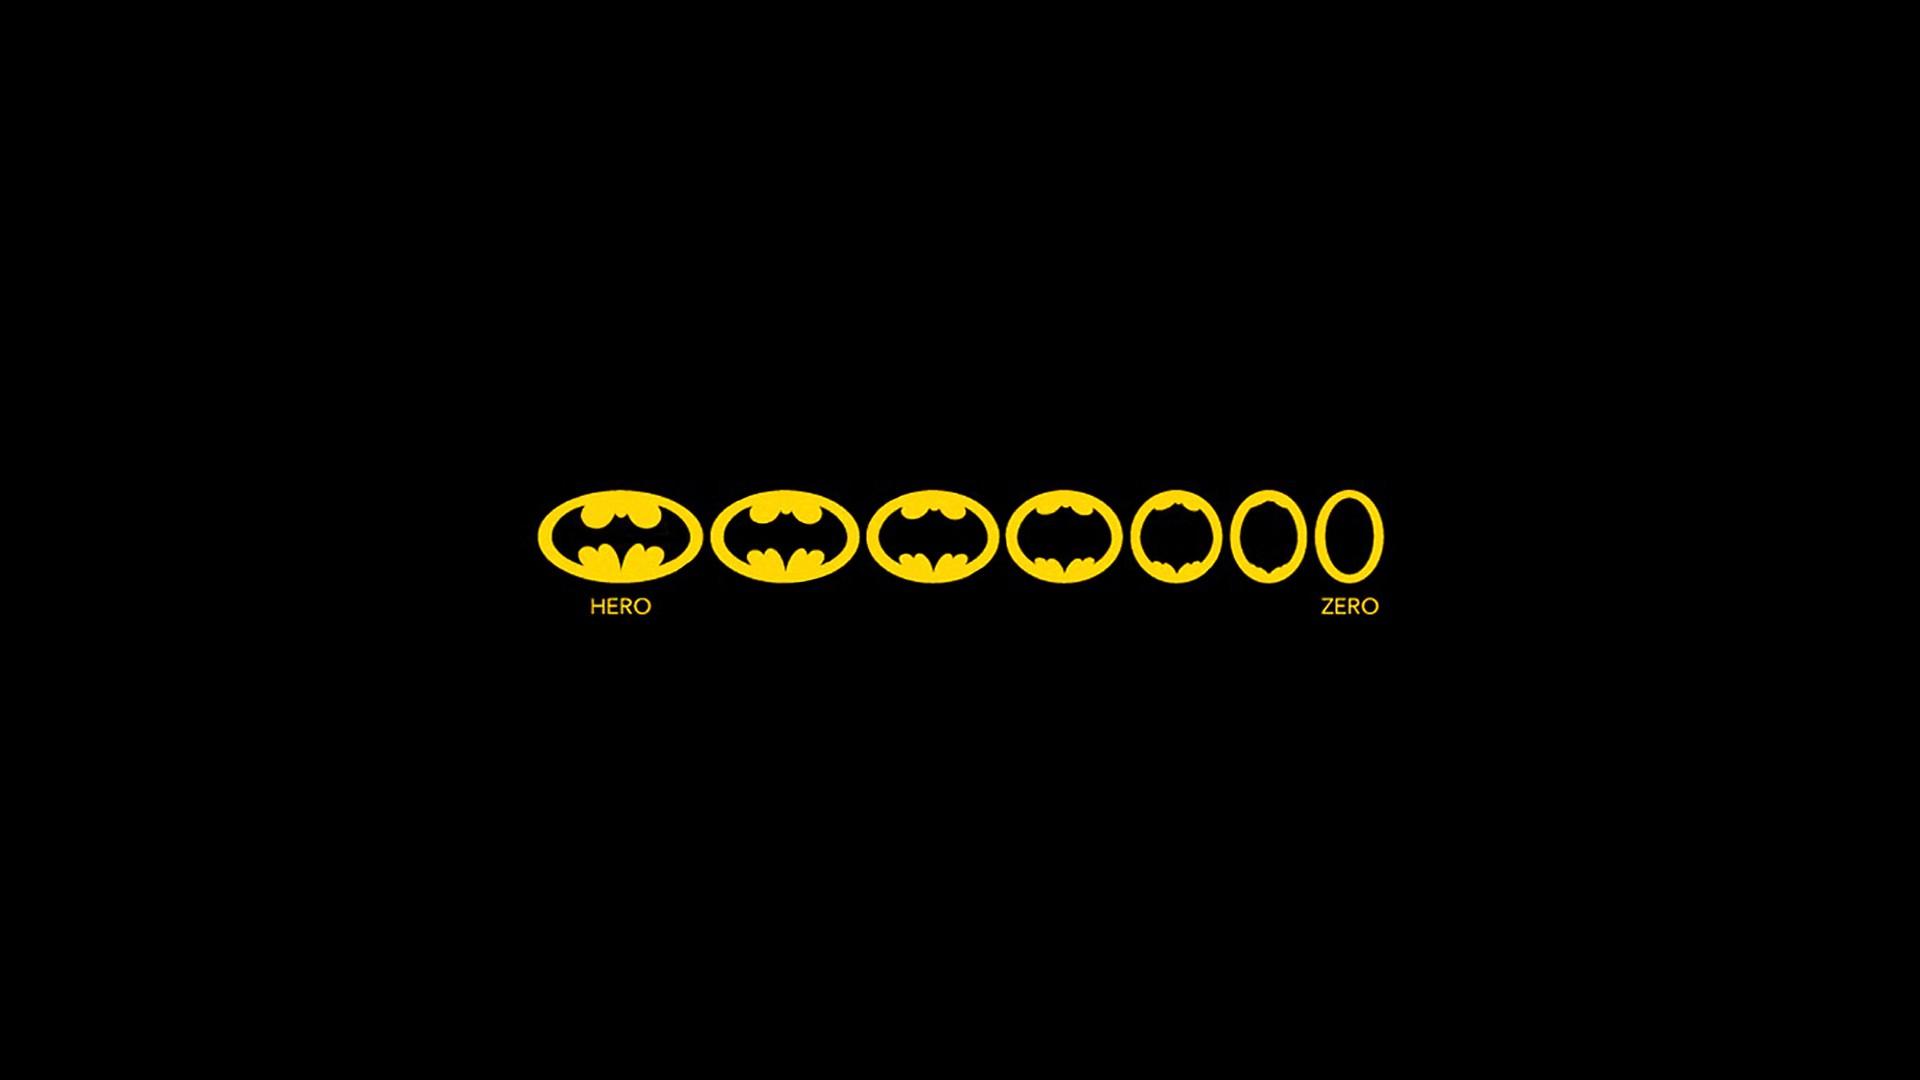 Batman Logo Wallpapers Wallpaper 1920x1080